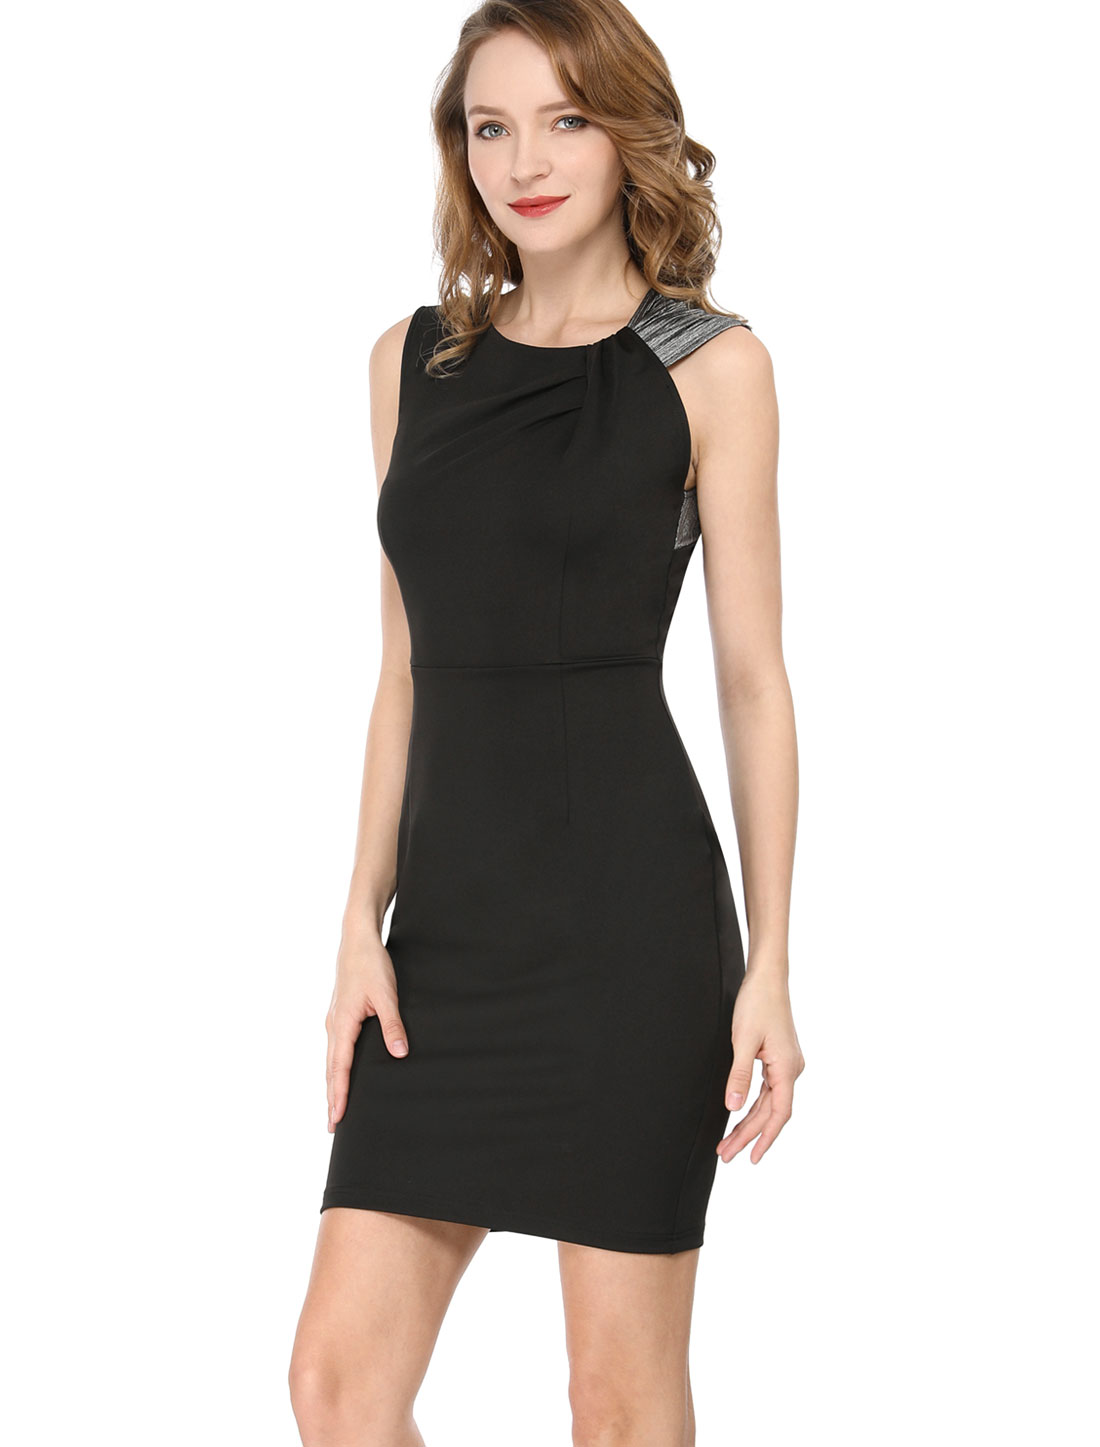 Allegra K Women's Metallic Shiny Shoulder Party Sheath Dress Black S